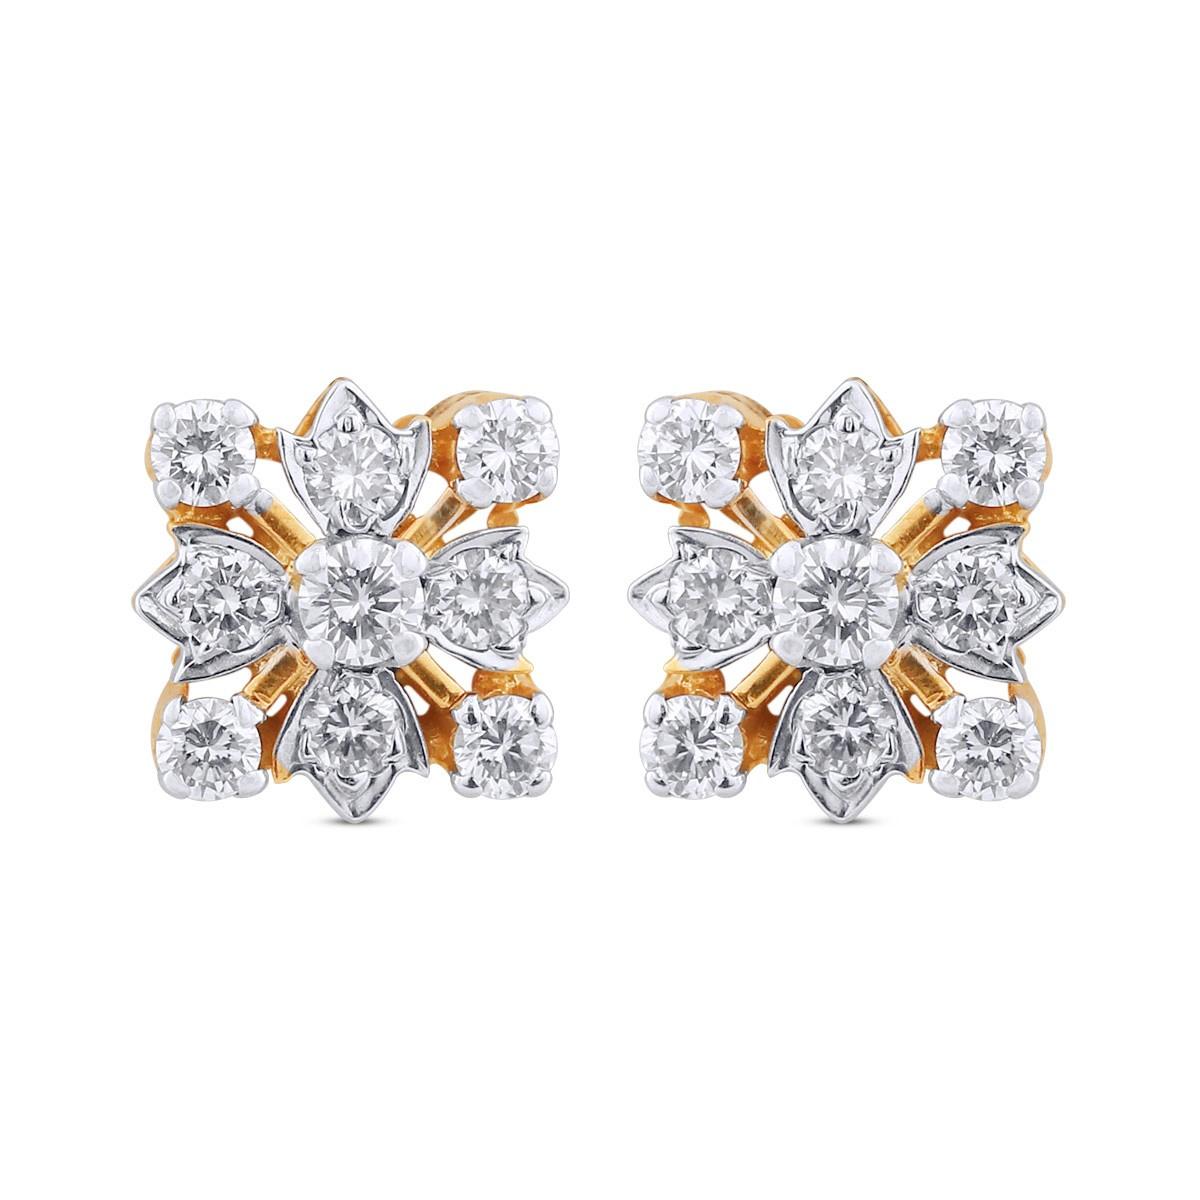 Allison Yellow Gold Diamond Stud Earrings